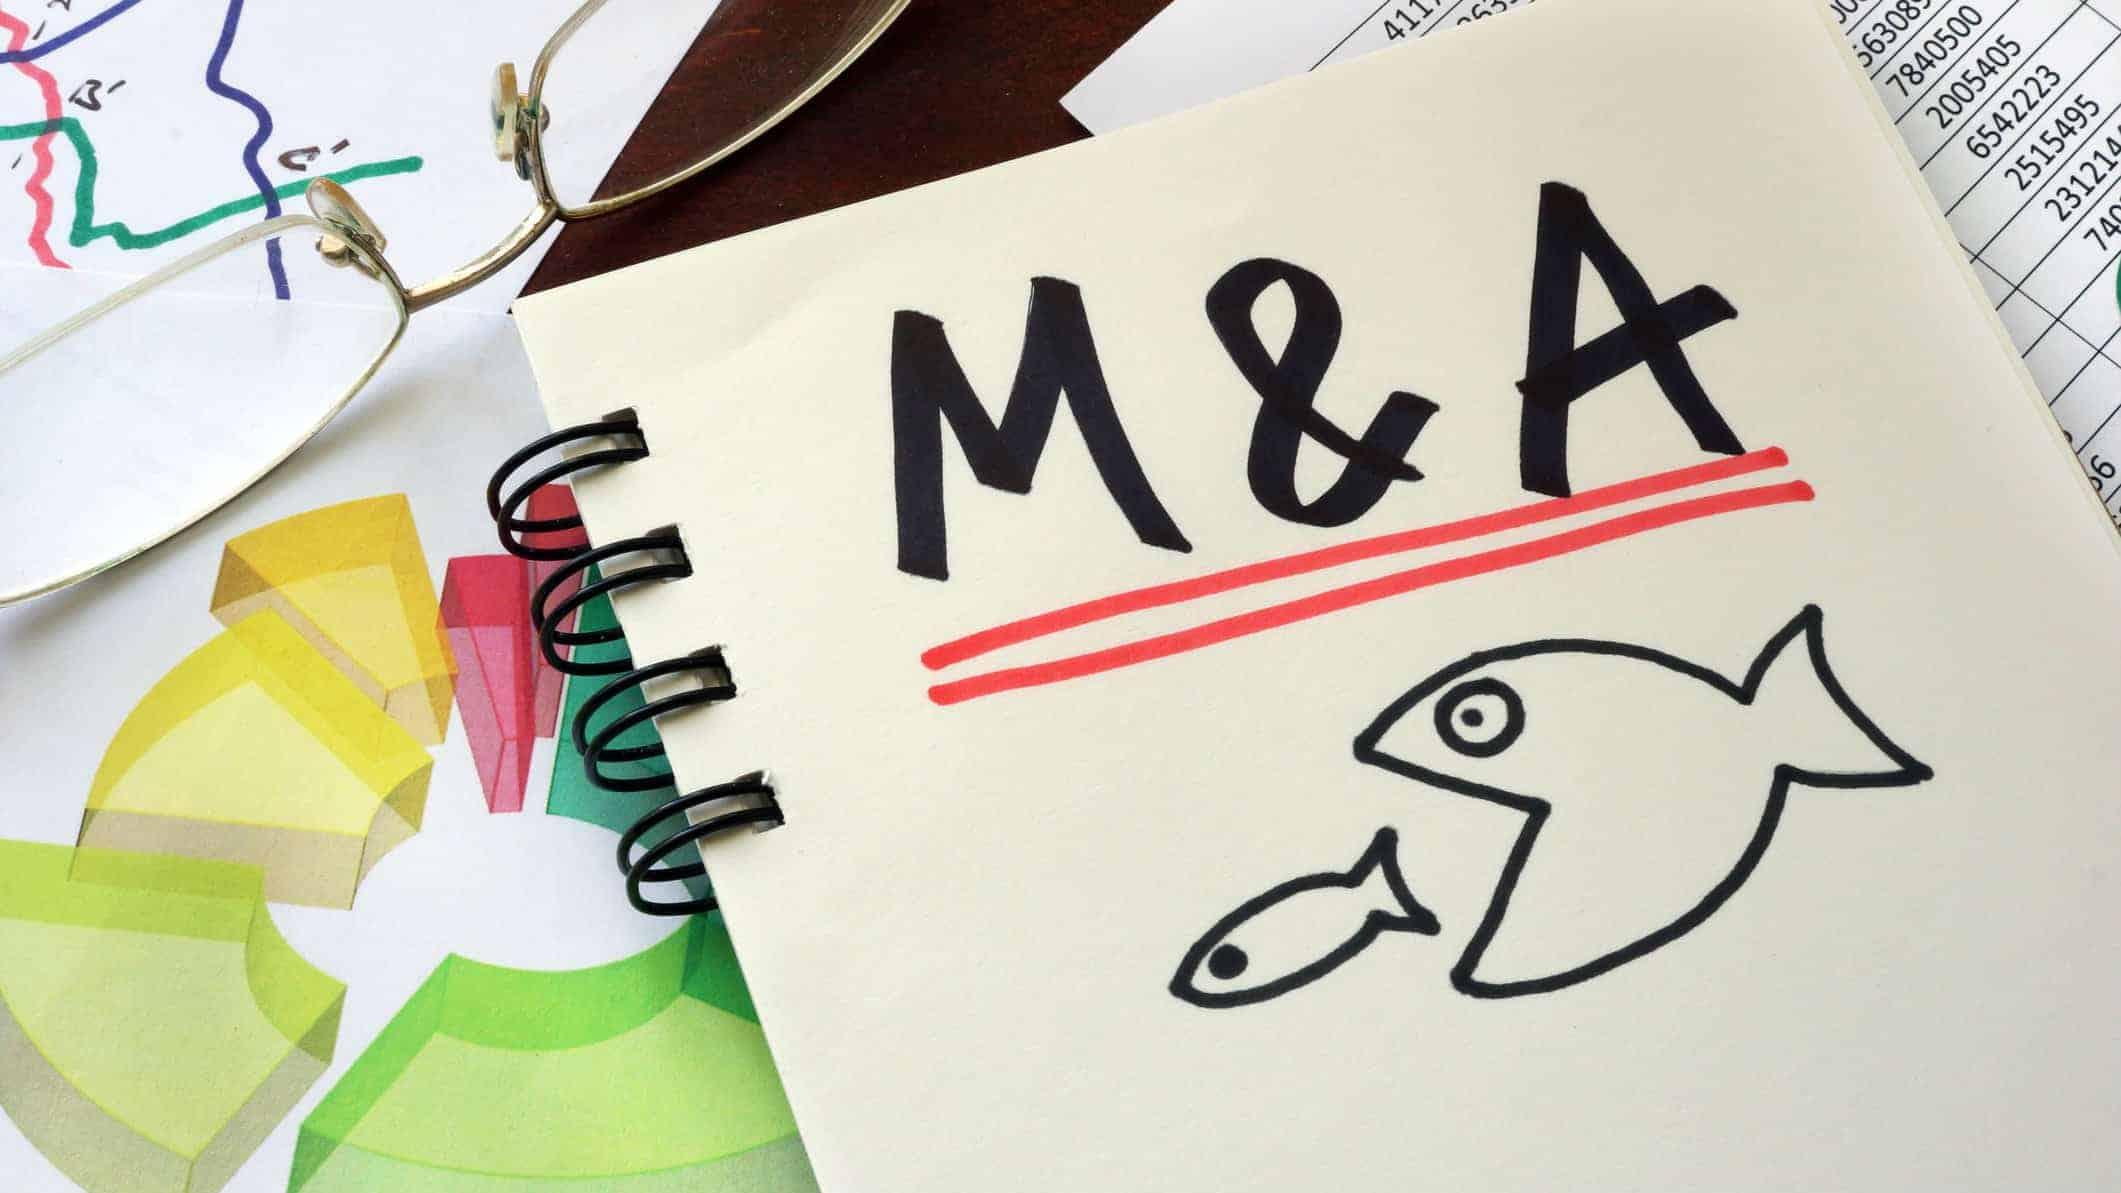 takeover M&A NRW takeover